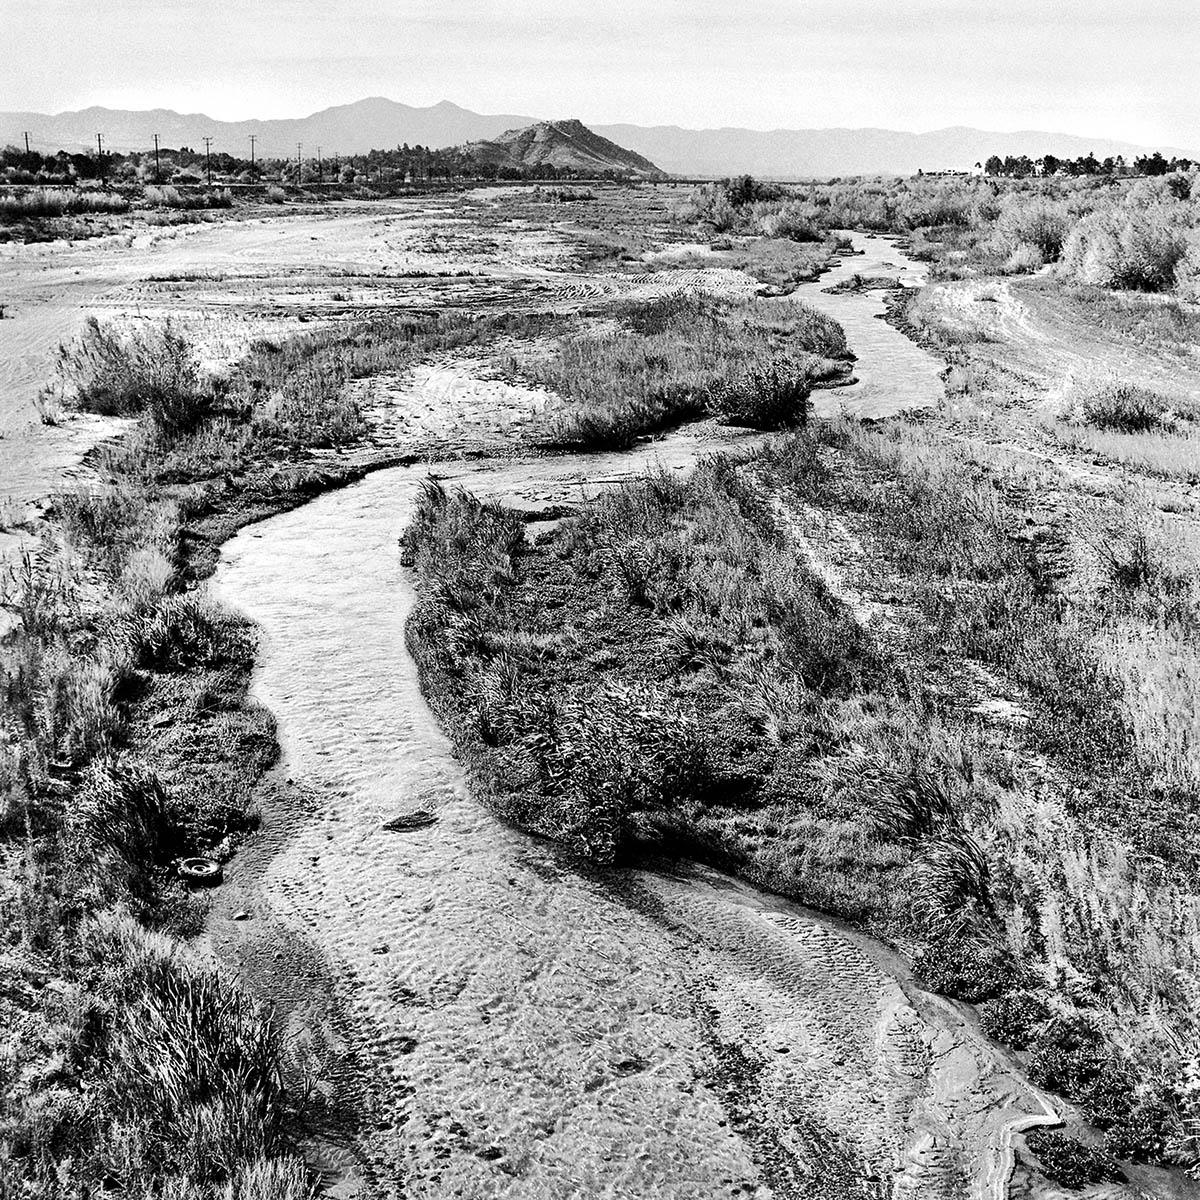 Santa Ana River, Riverside, California, 1995